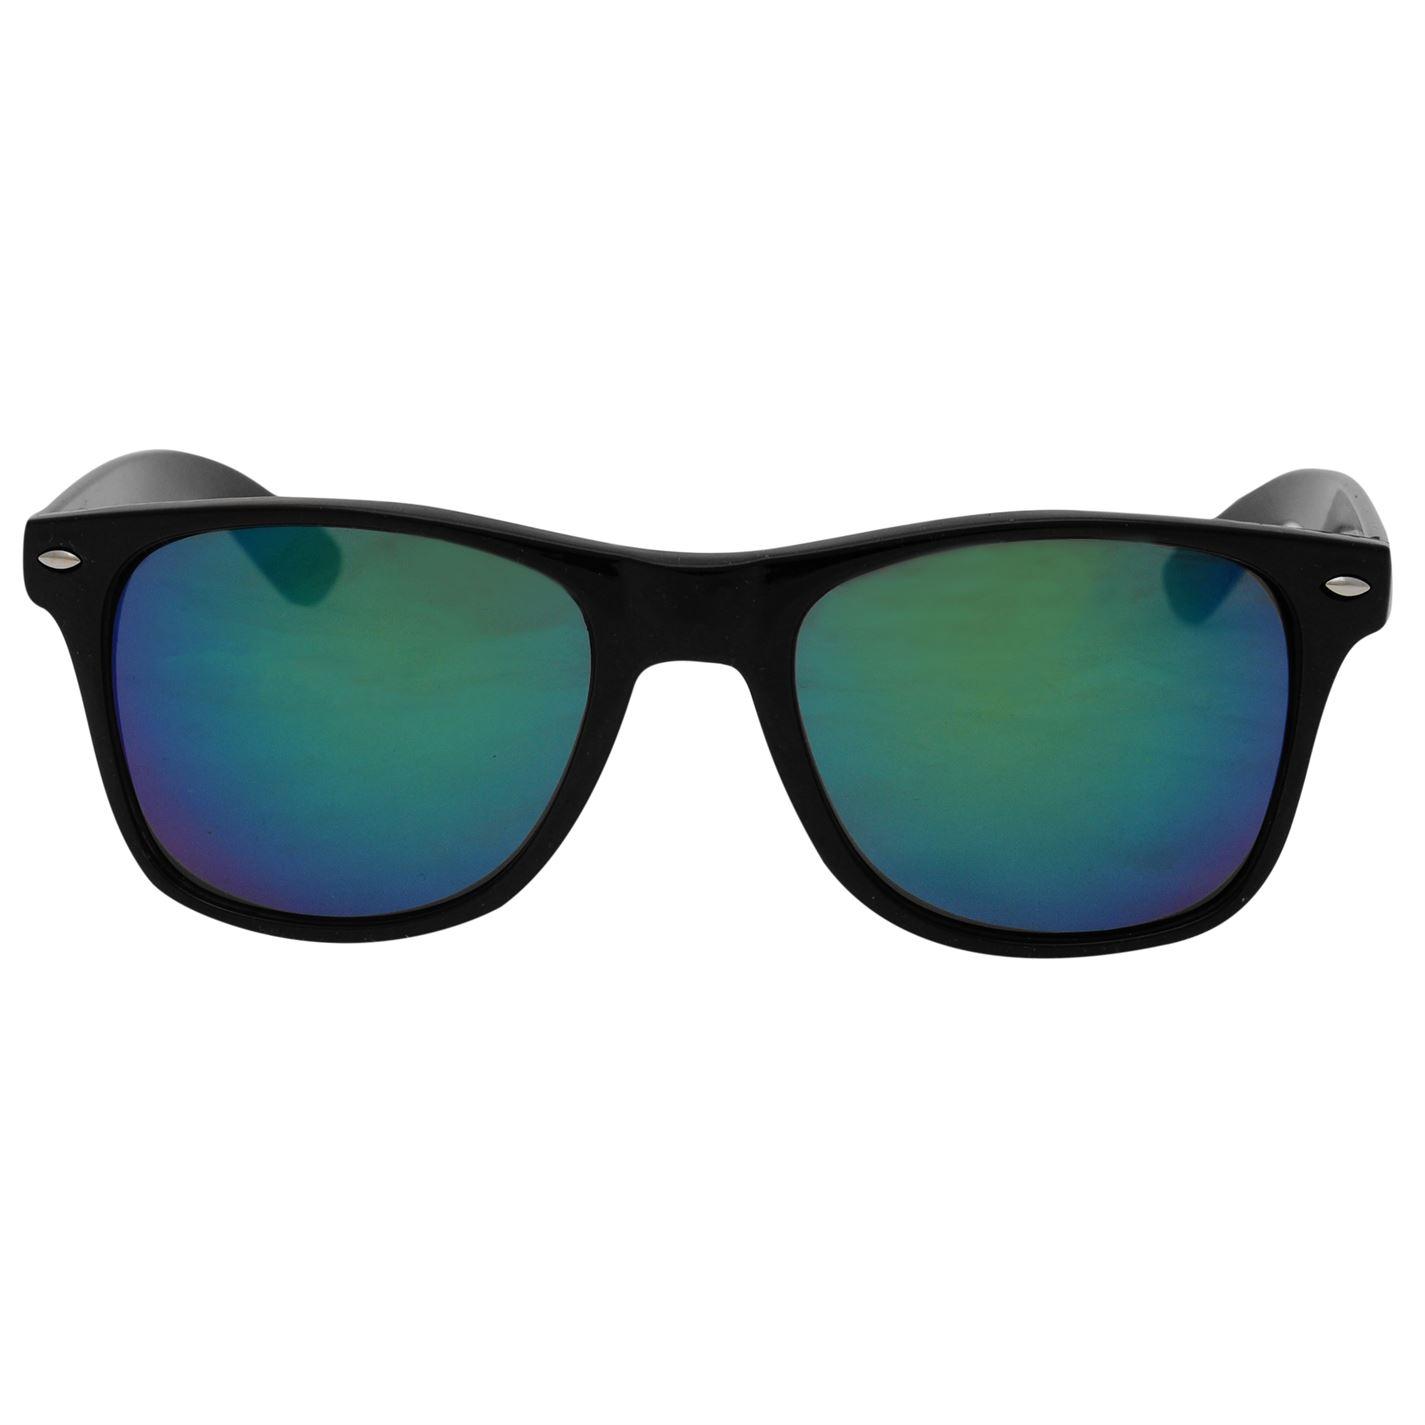 Pulp Iridescent Sunglasses Mens Gents Summer PLASTIC FRAME Tinted Lens